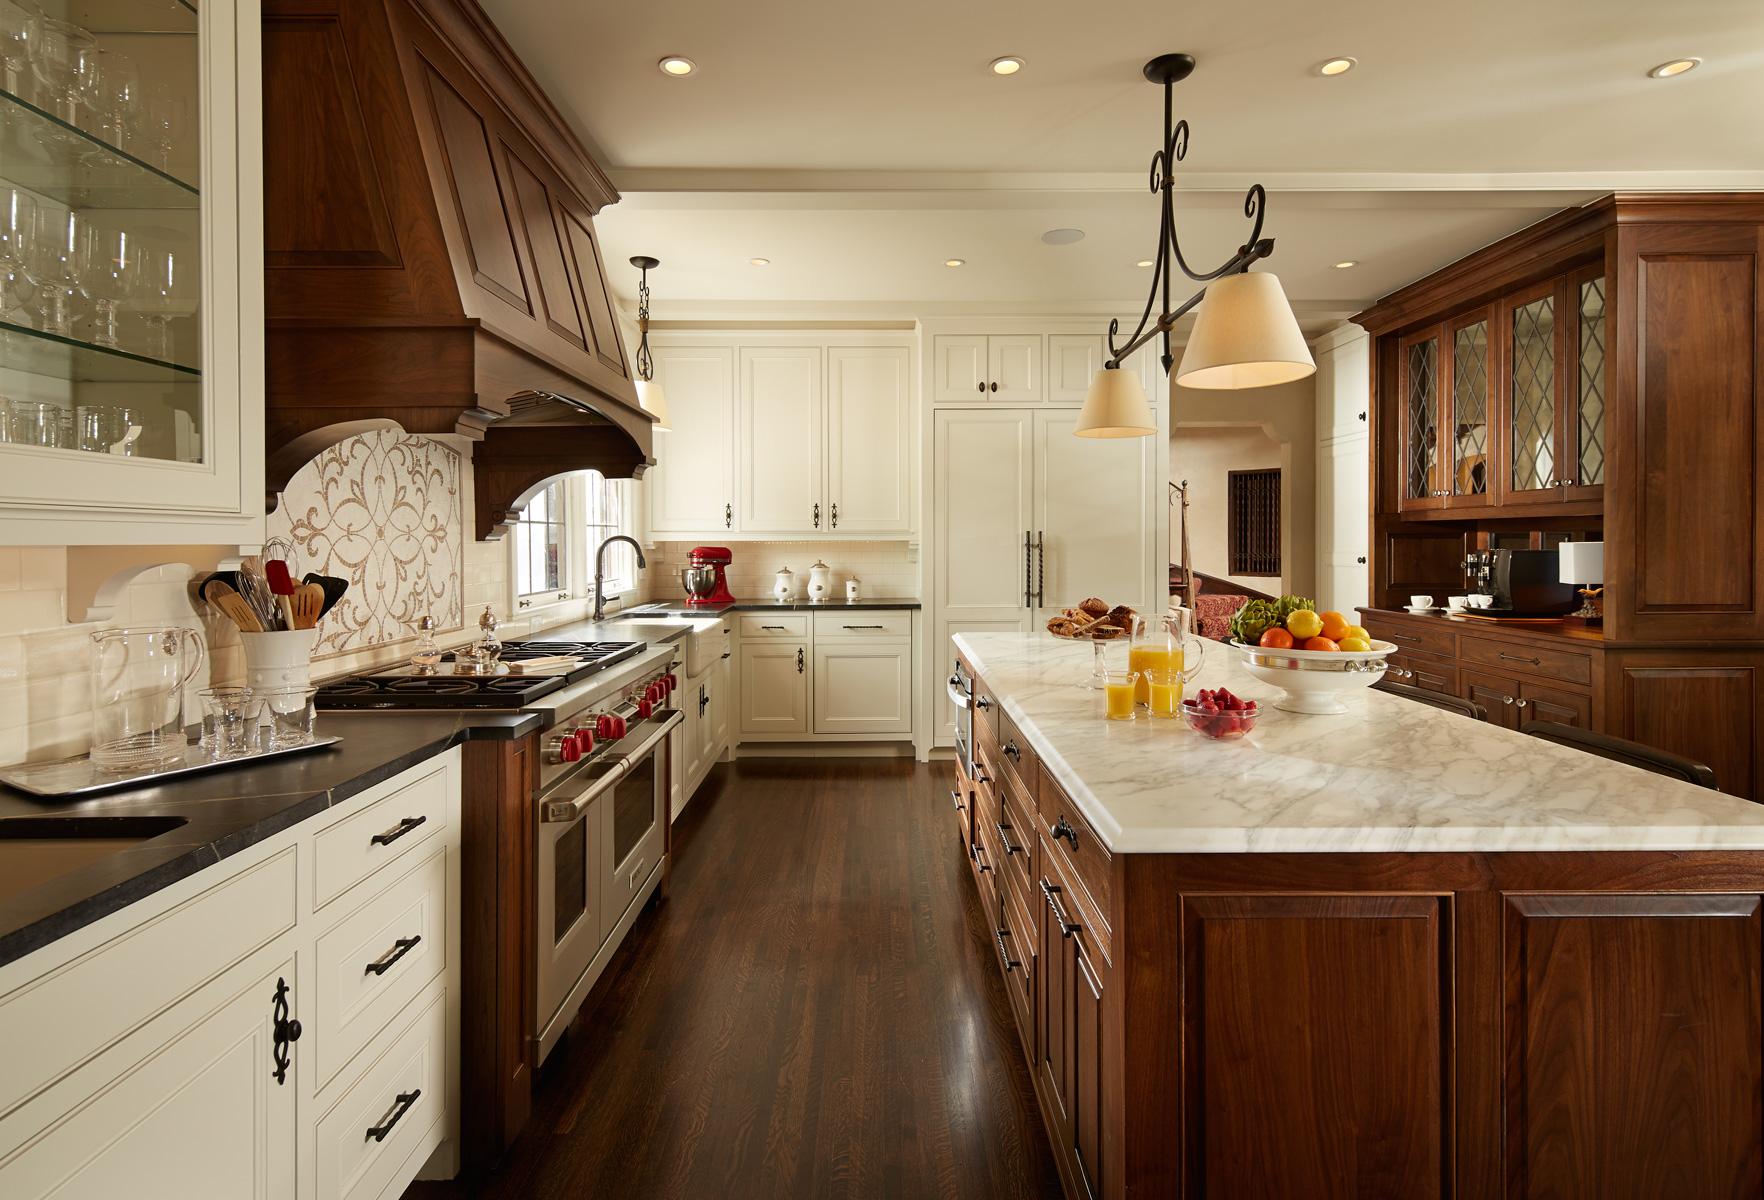 10Batson_kitchen1_8110FINAL.jpg